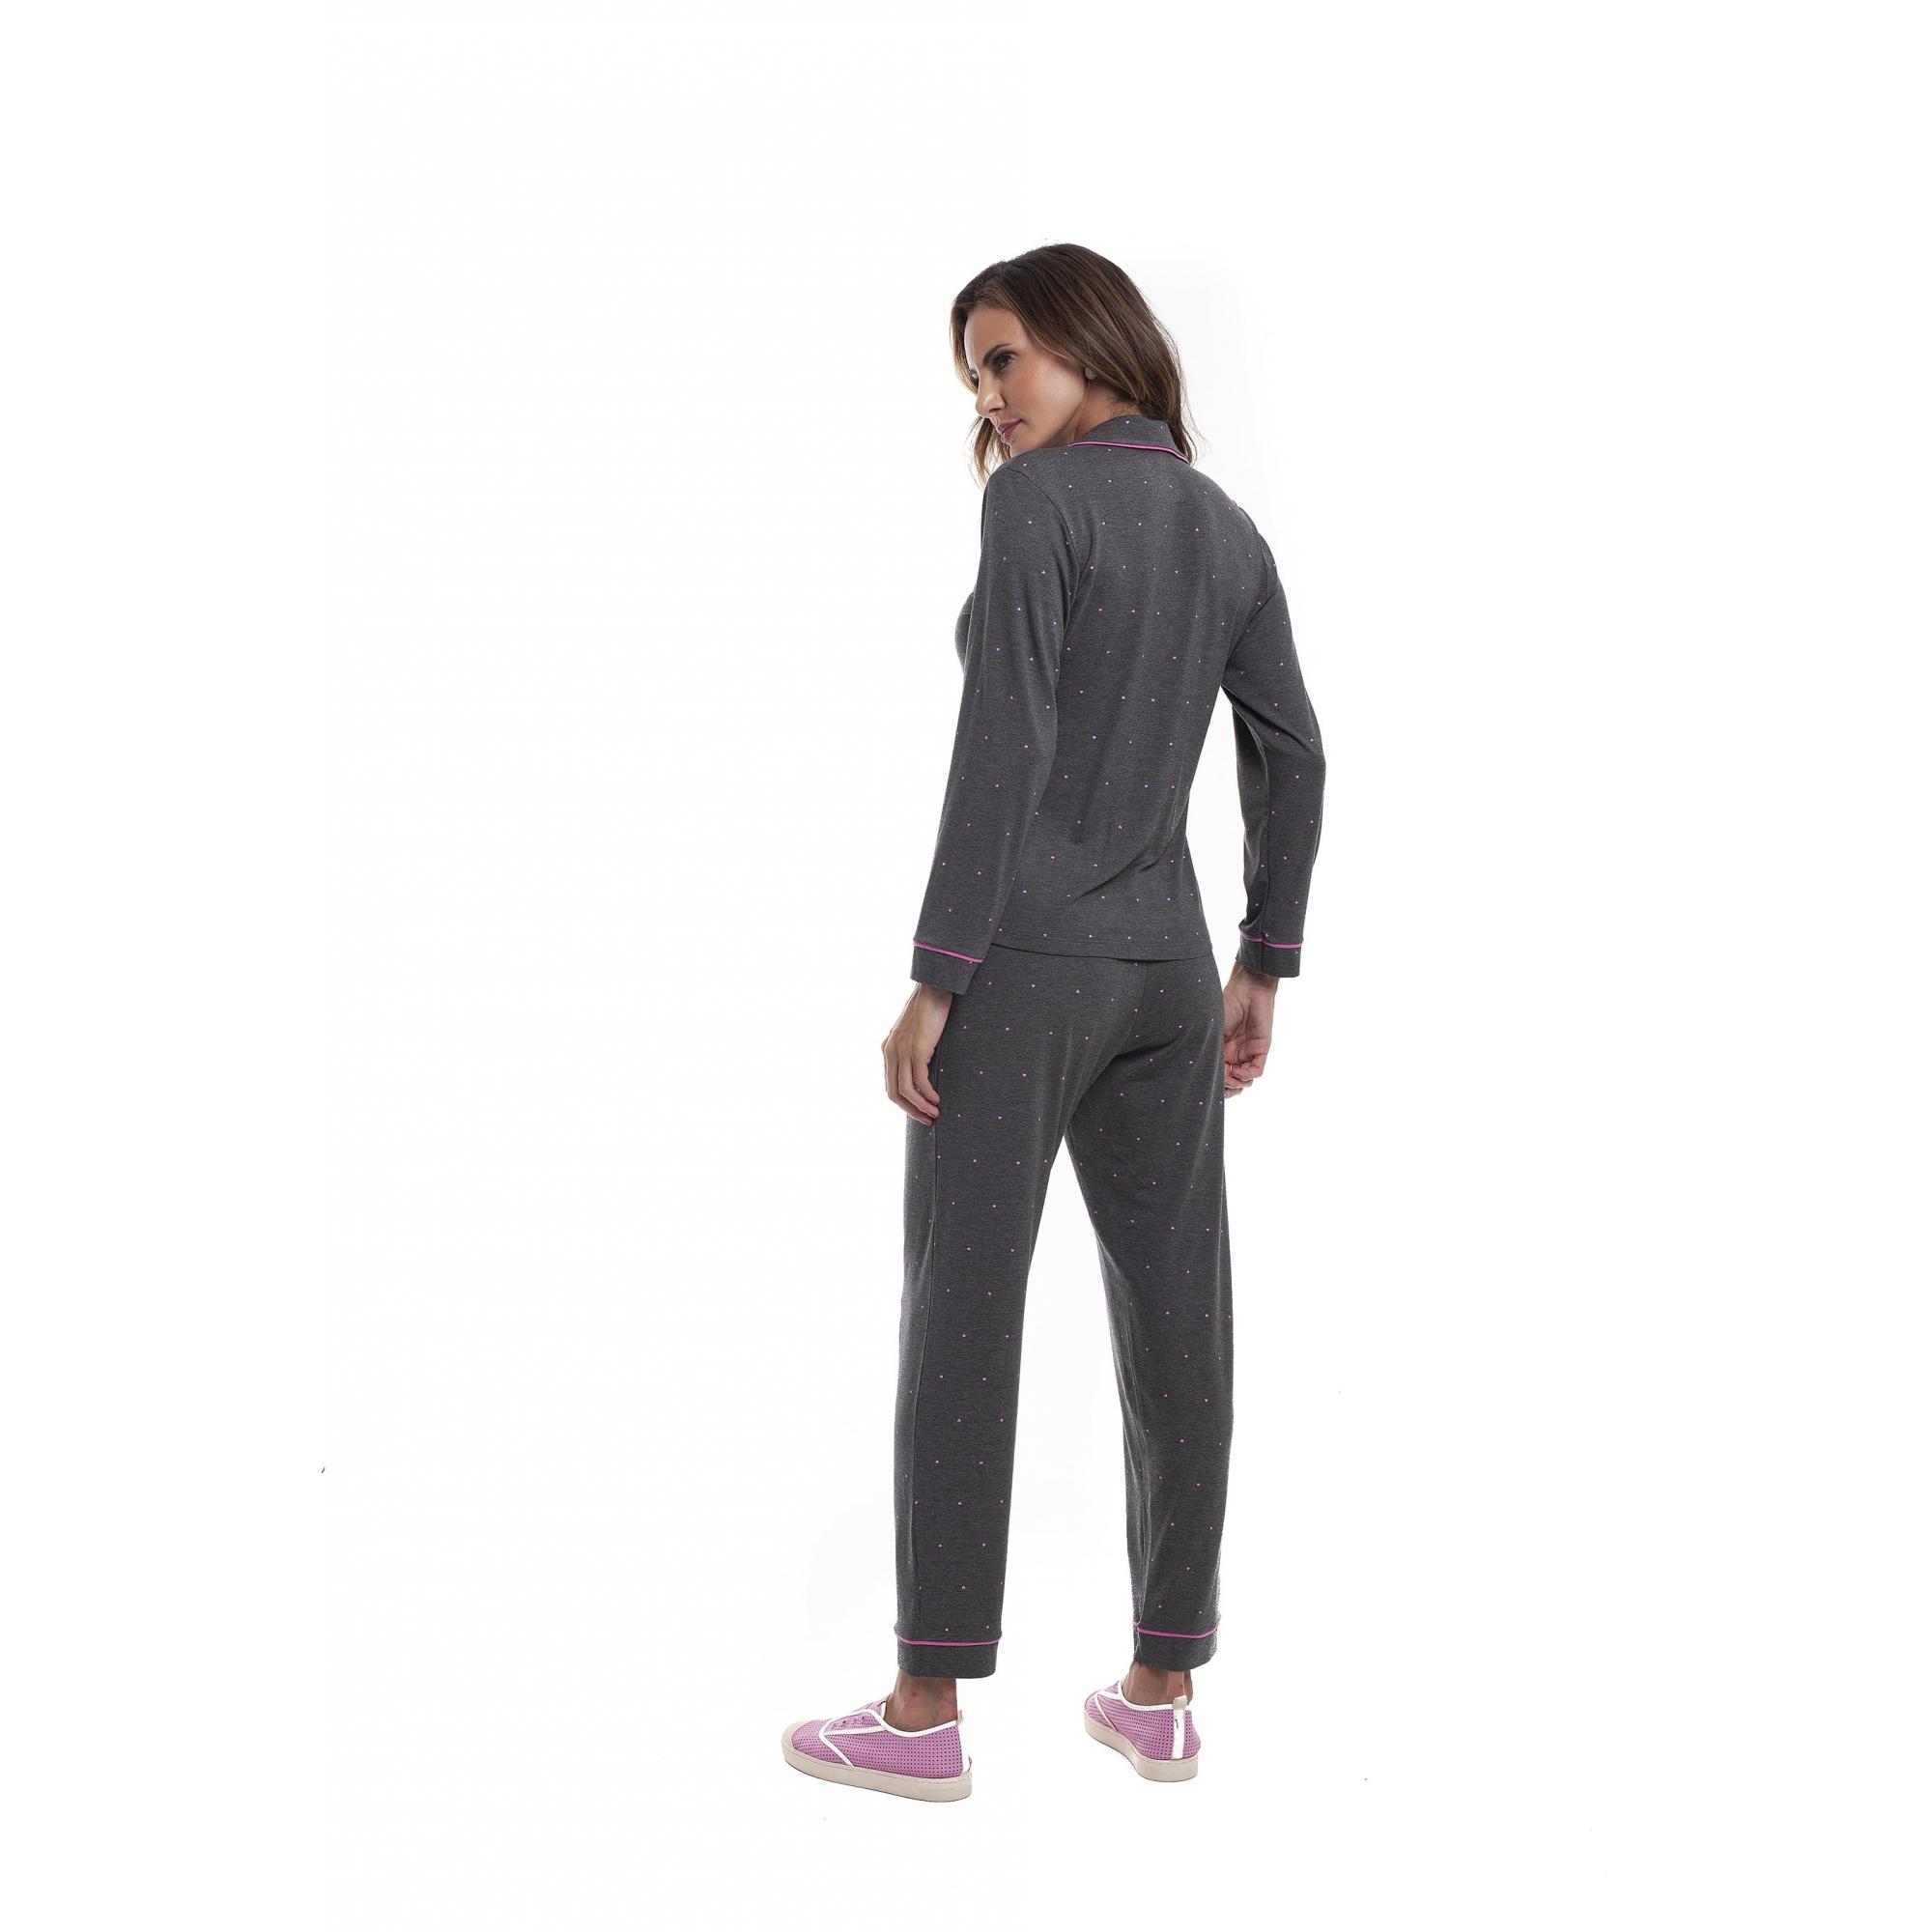 Pijama Feminino Adulto Paulienne Longo Aberto com gola Viscoflex Mescla Corações 37965